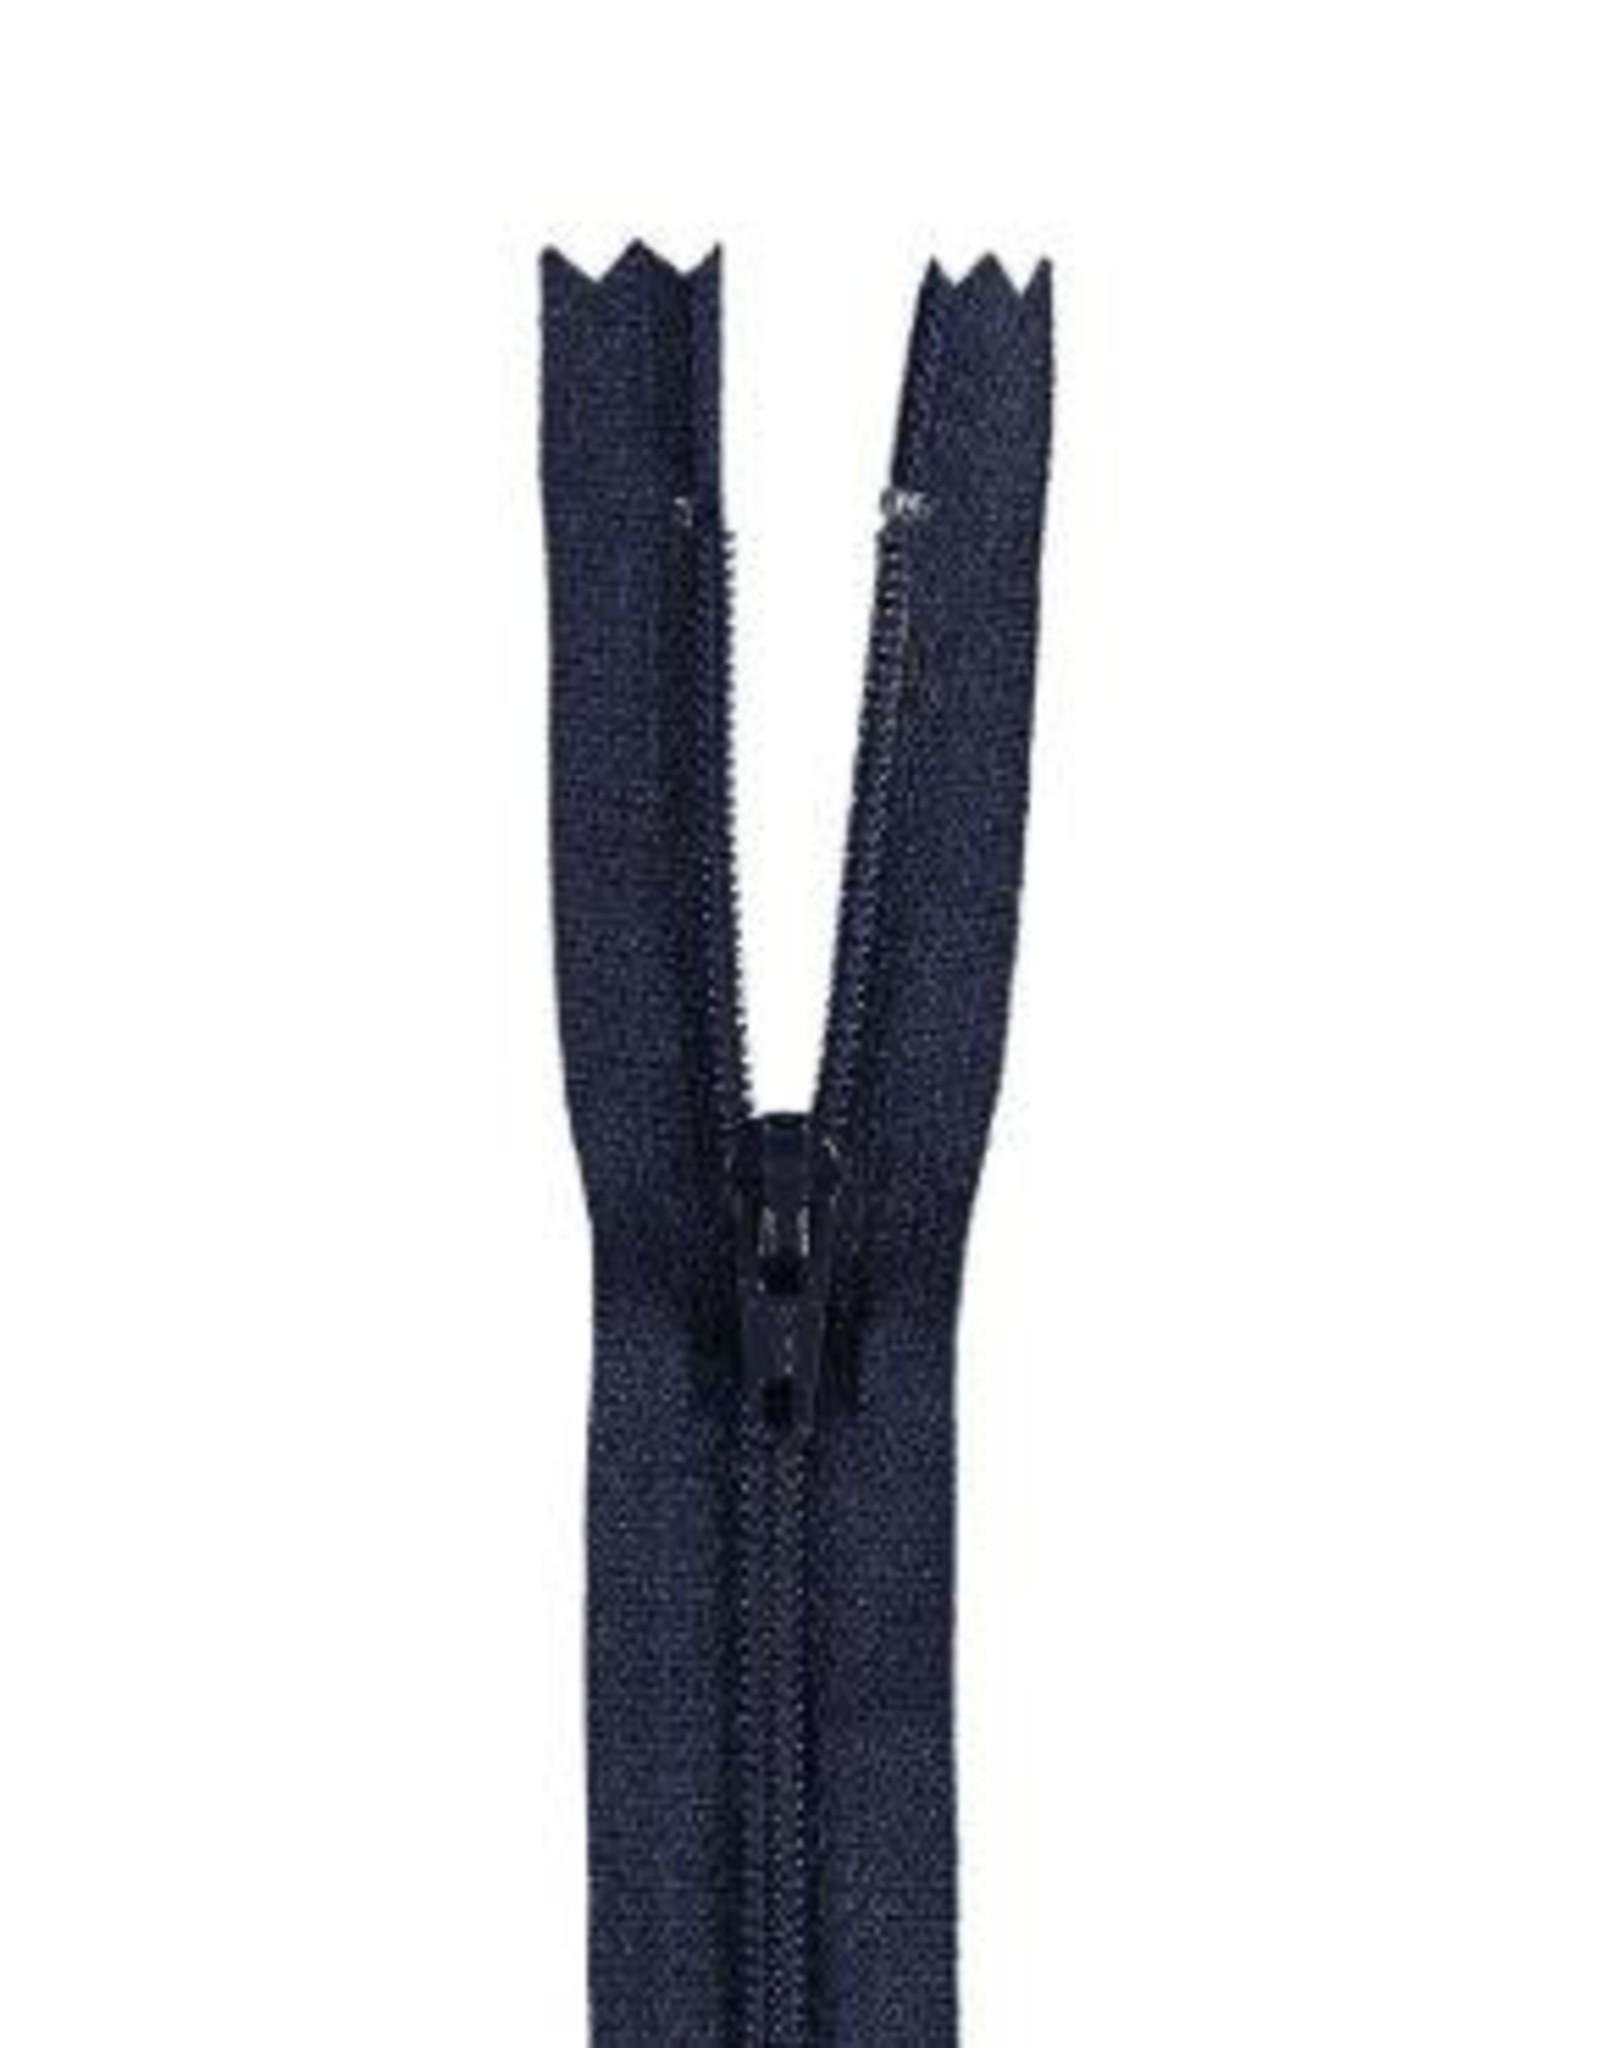 YKK Spiraalrits niet-DB 3mm d. blauw gr 168-25cm